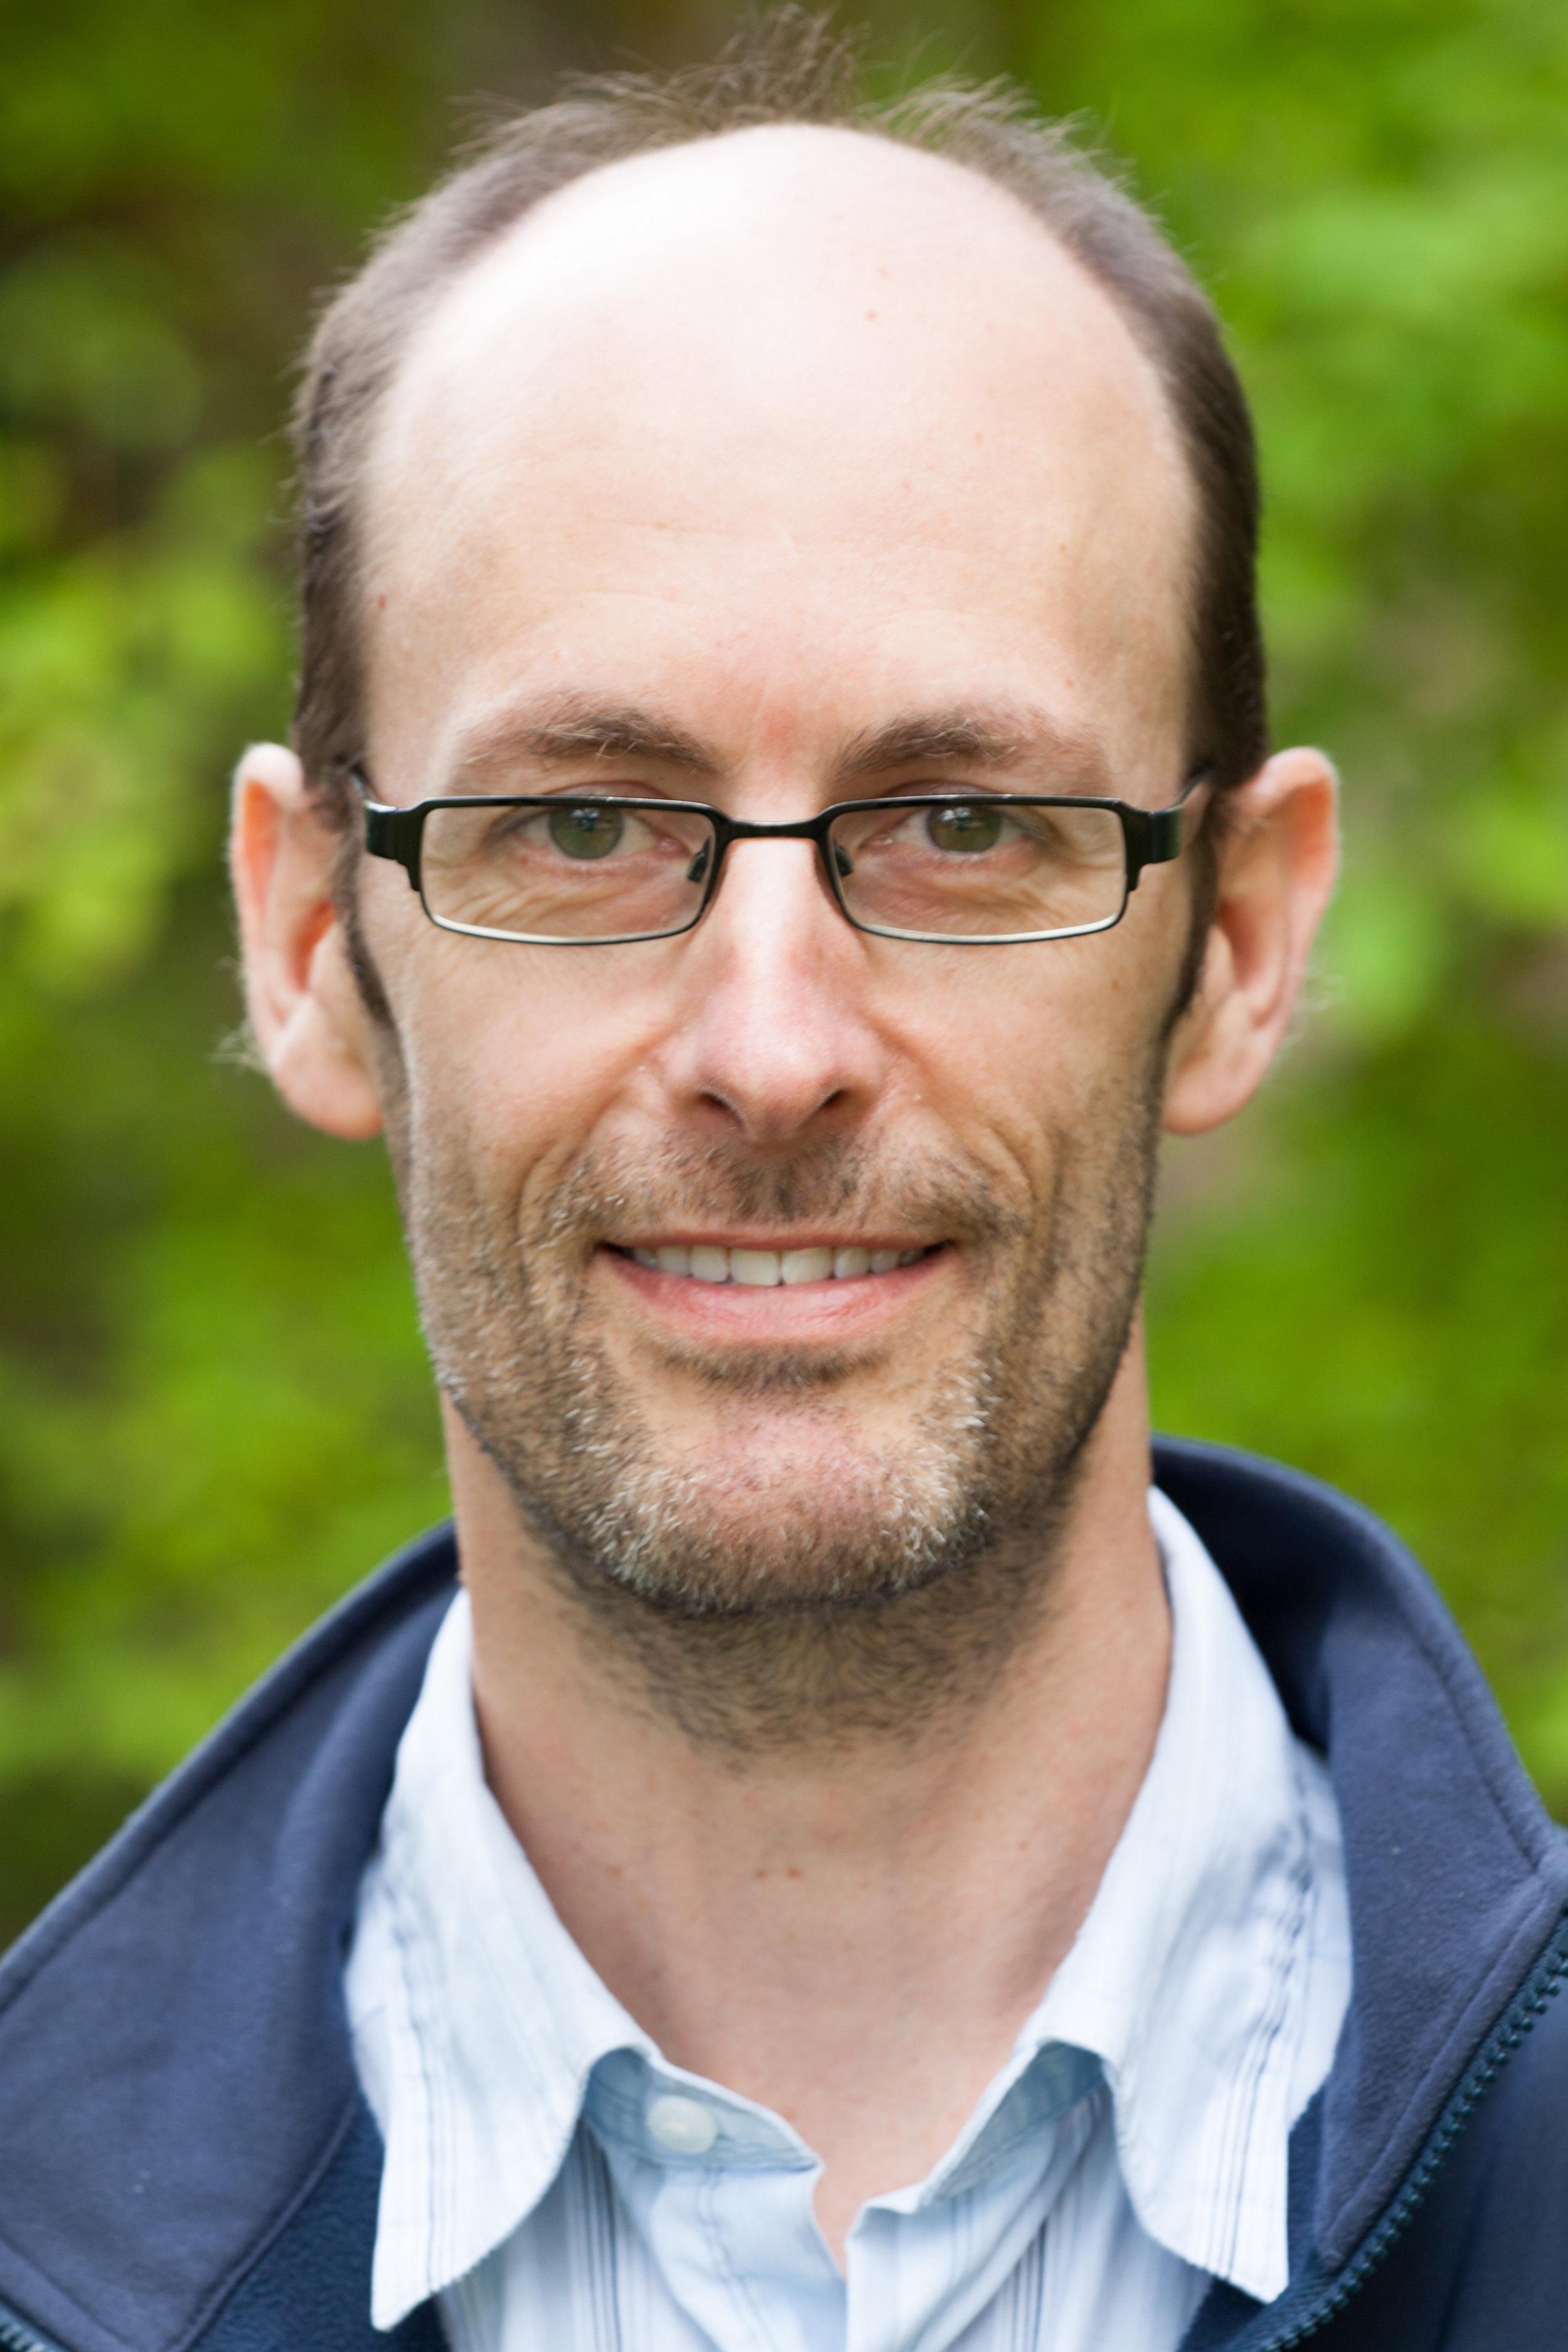 Marc Ridyard - Lab Manager/PostDoctoral FellowPhD 1999, University of Alberta, Canadamr652@cam.ac.uk